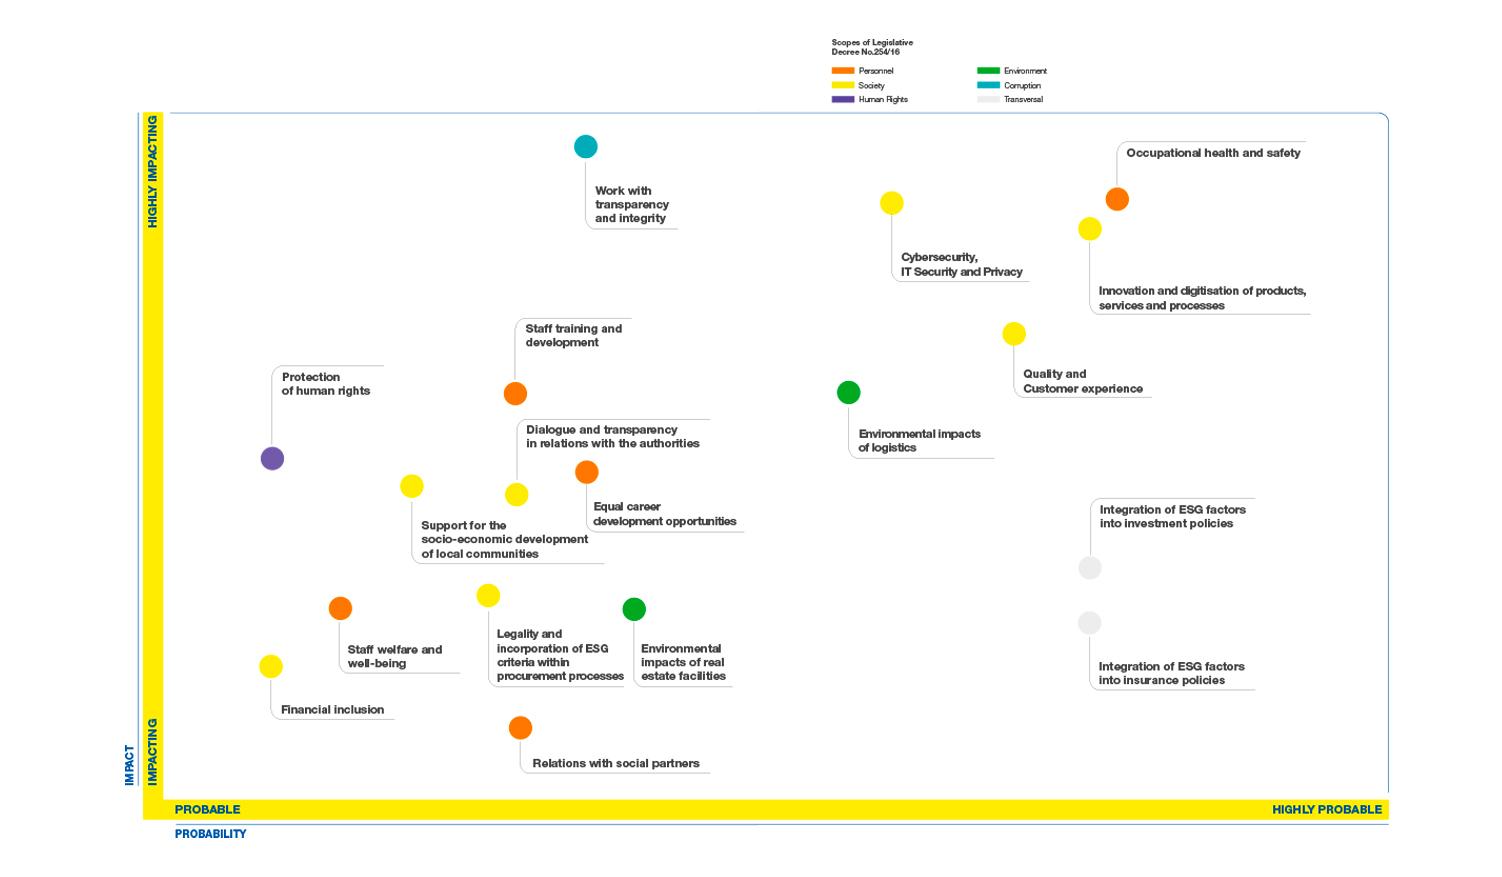 Poste Italiane Group's impact matrix